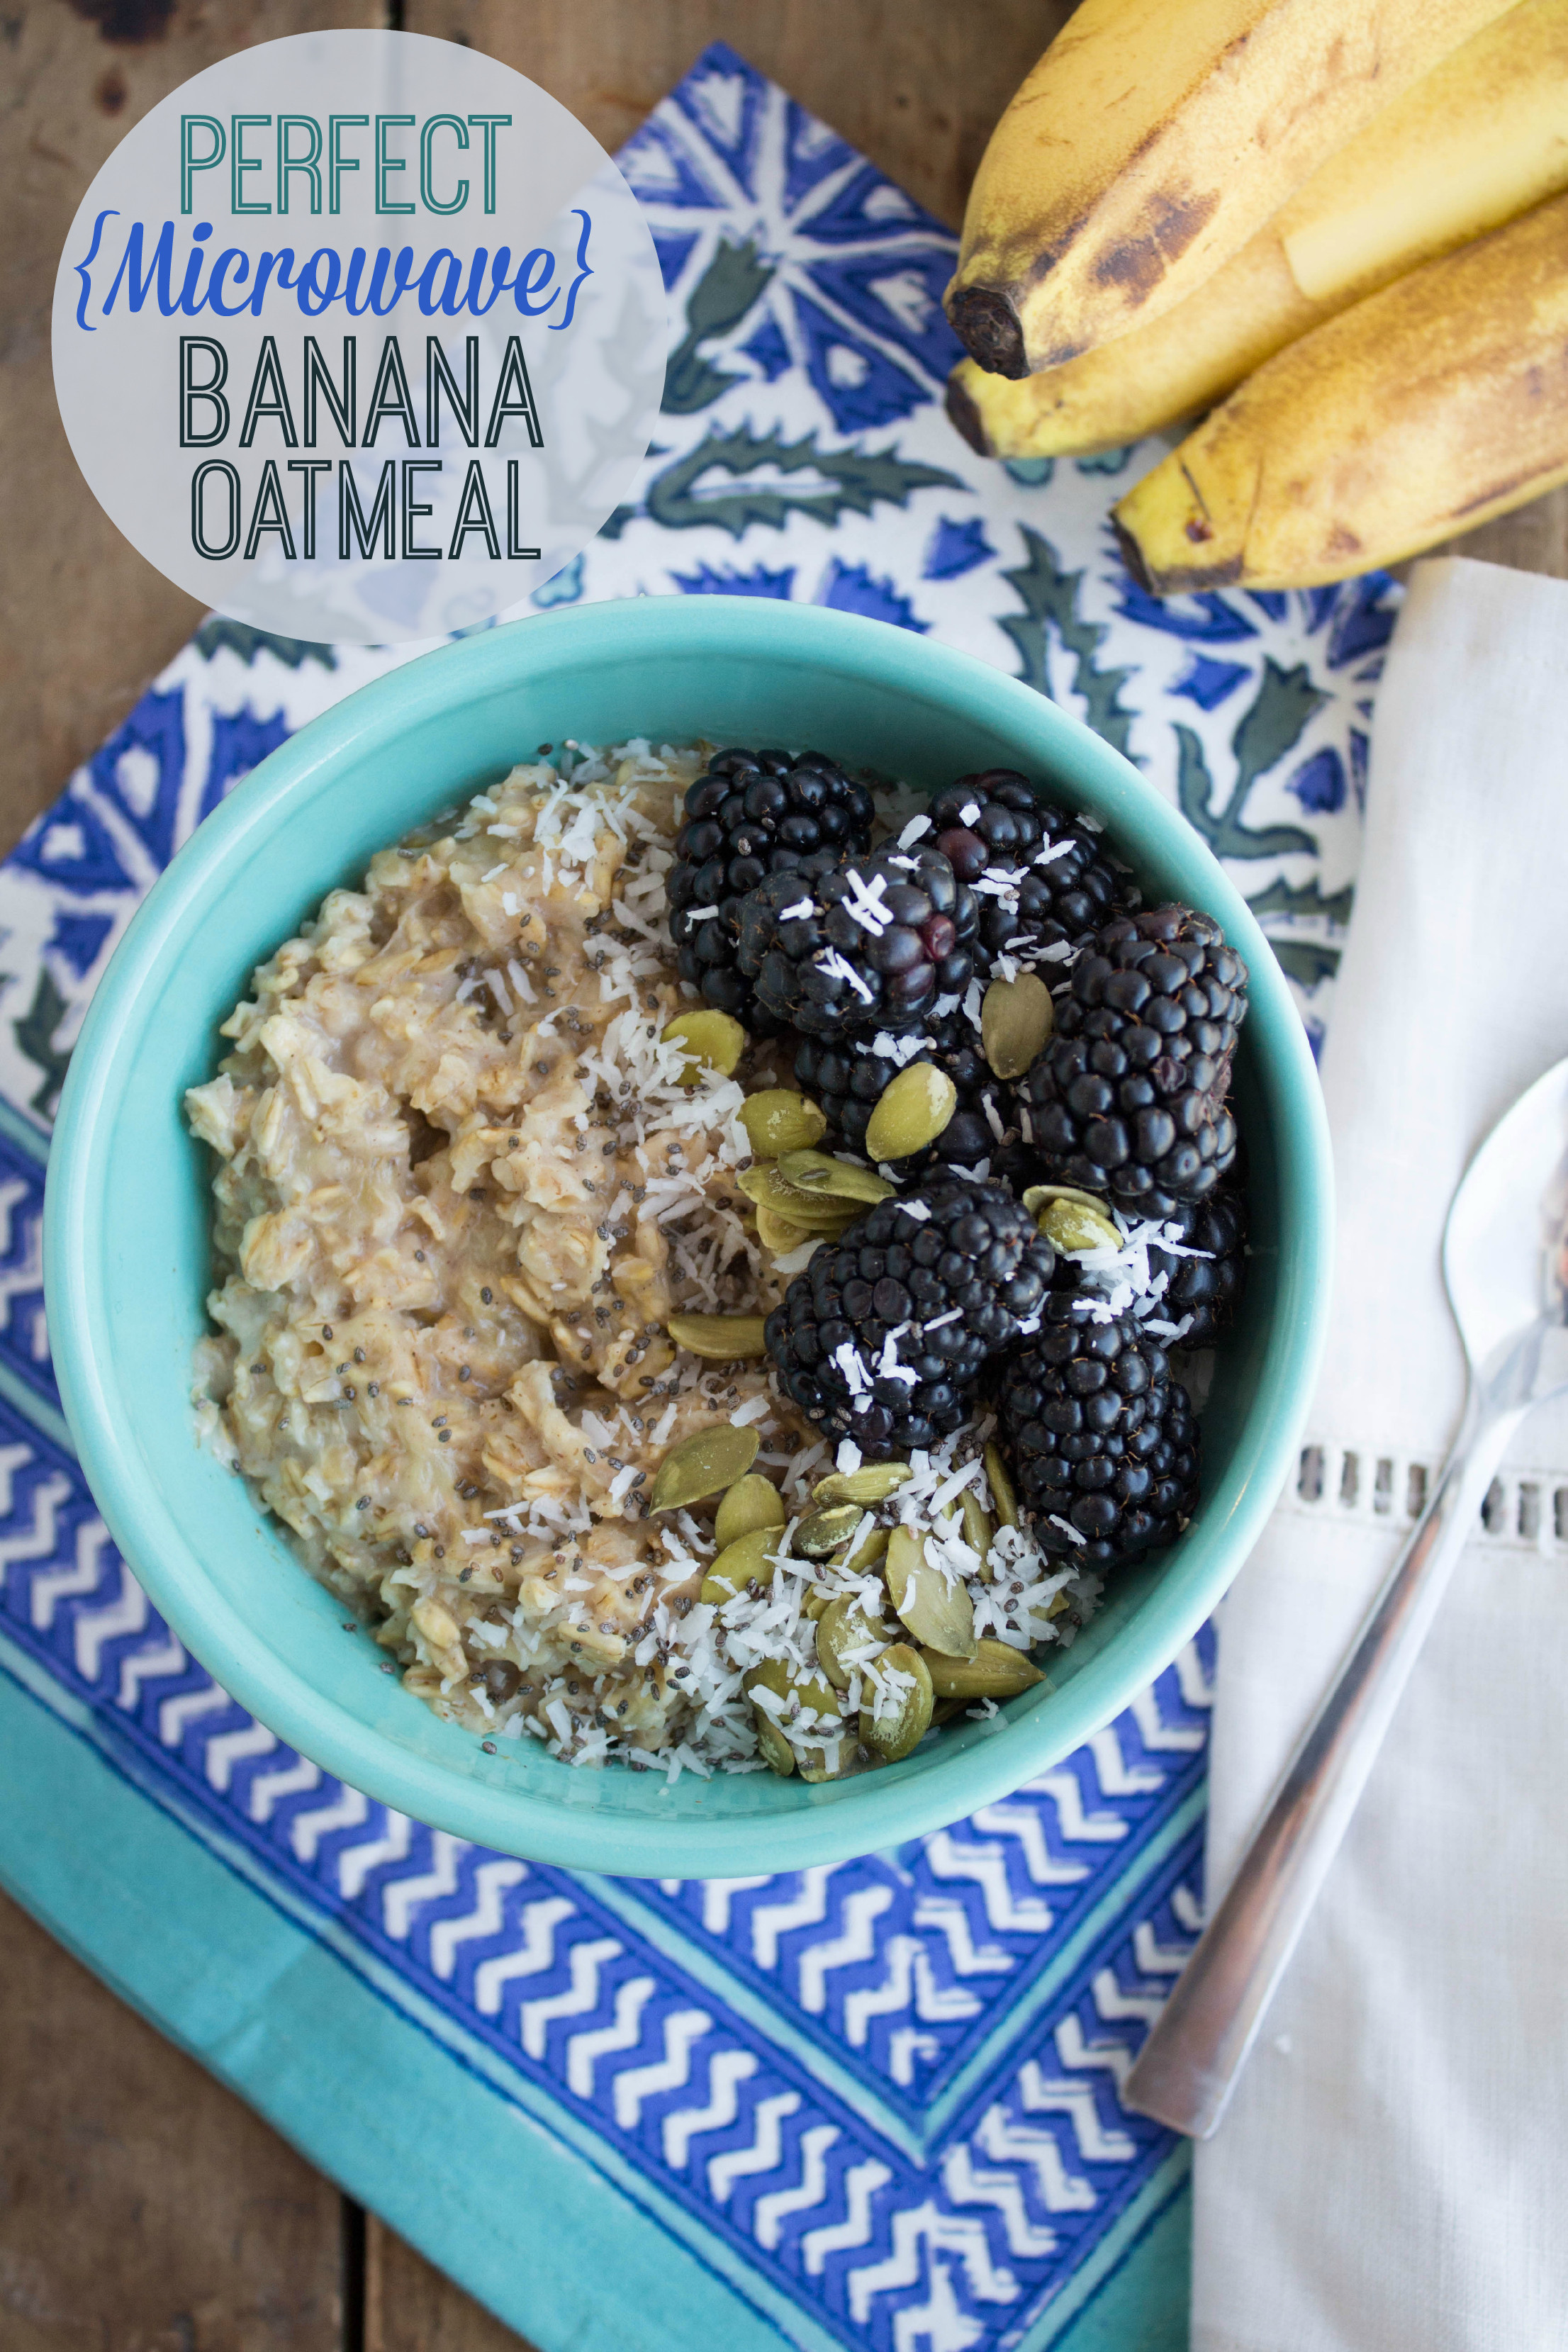 Oatmeal Recipe For Breakfast  Perfect Microwave Banana Oatmeal Recipe